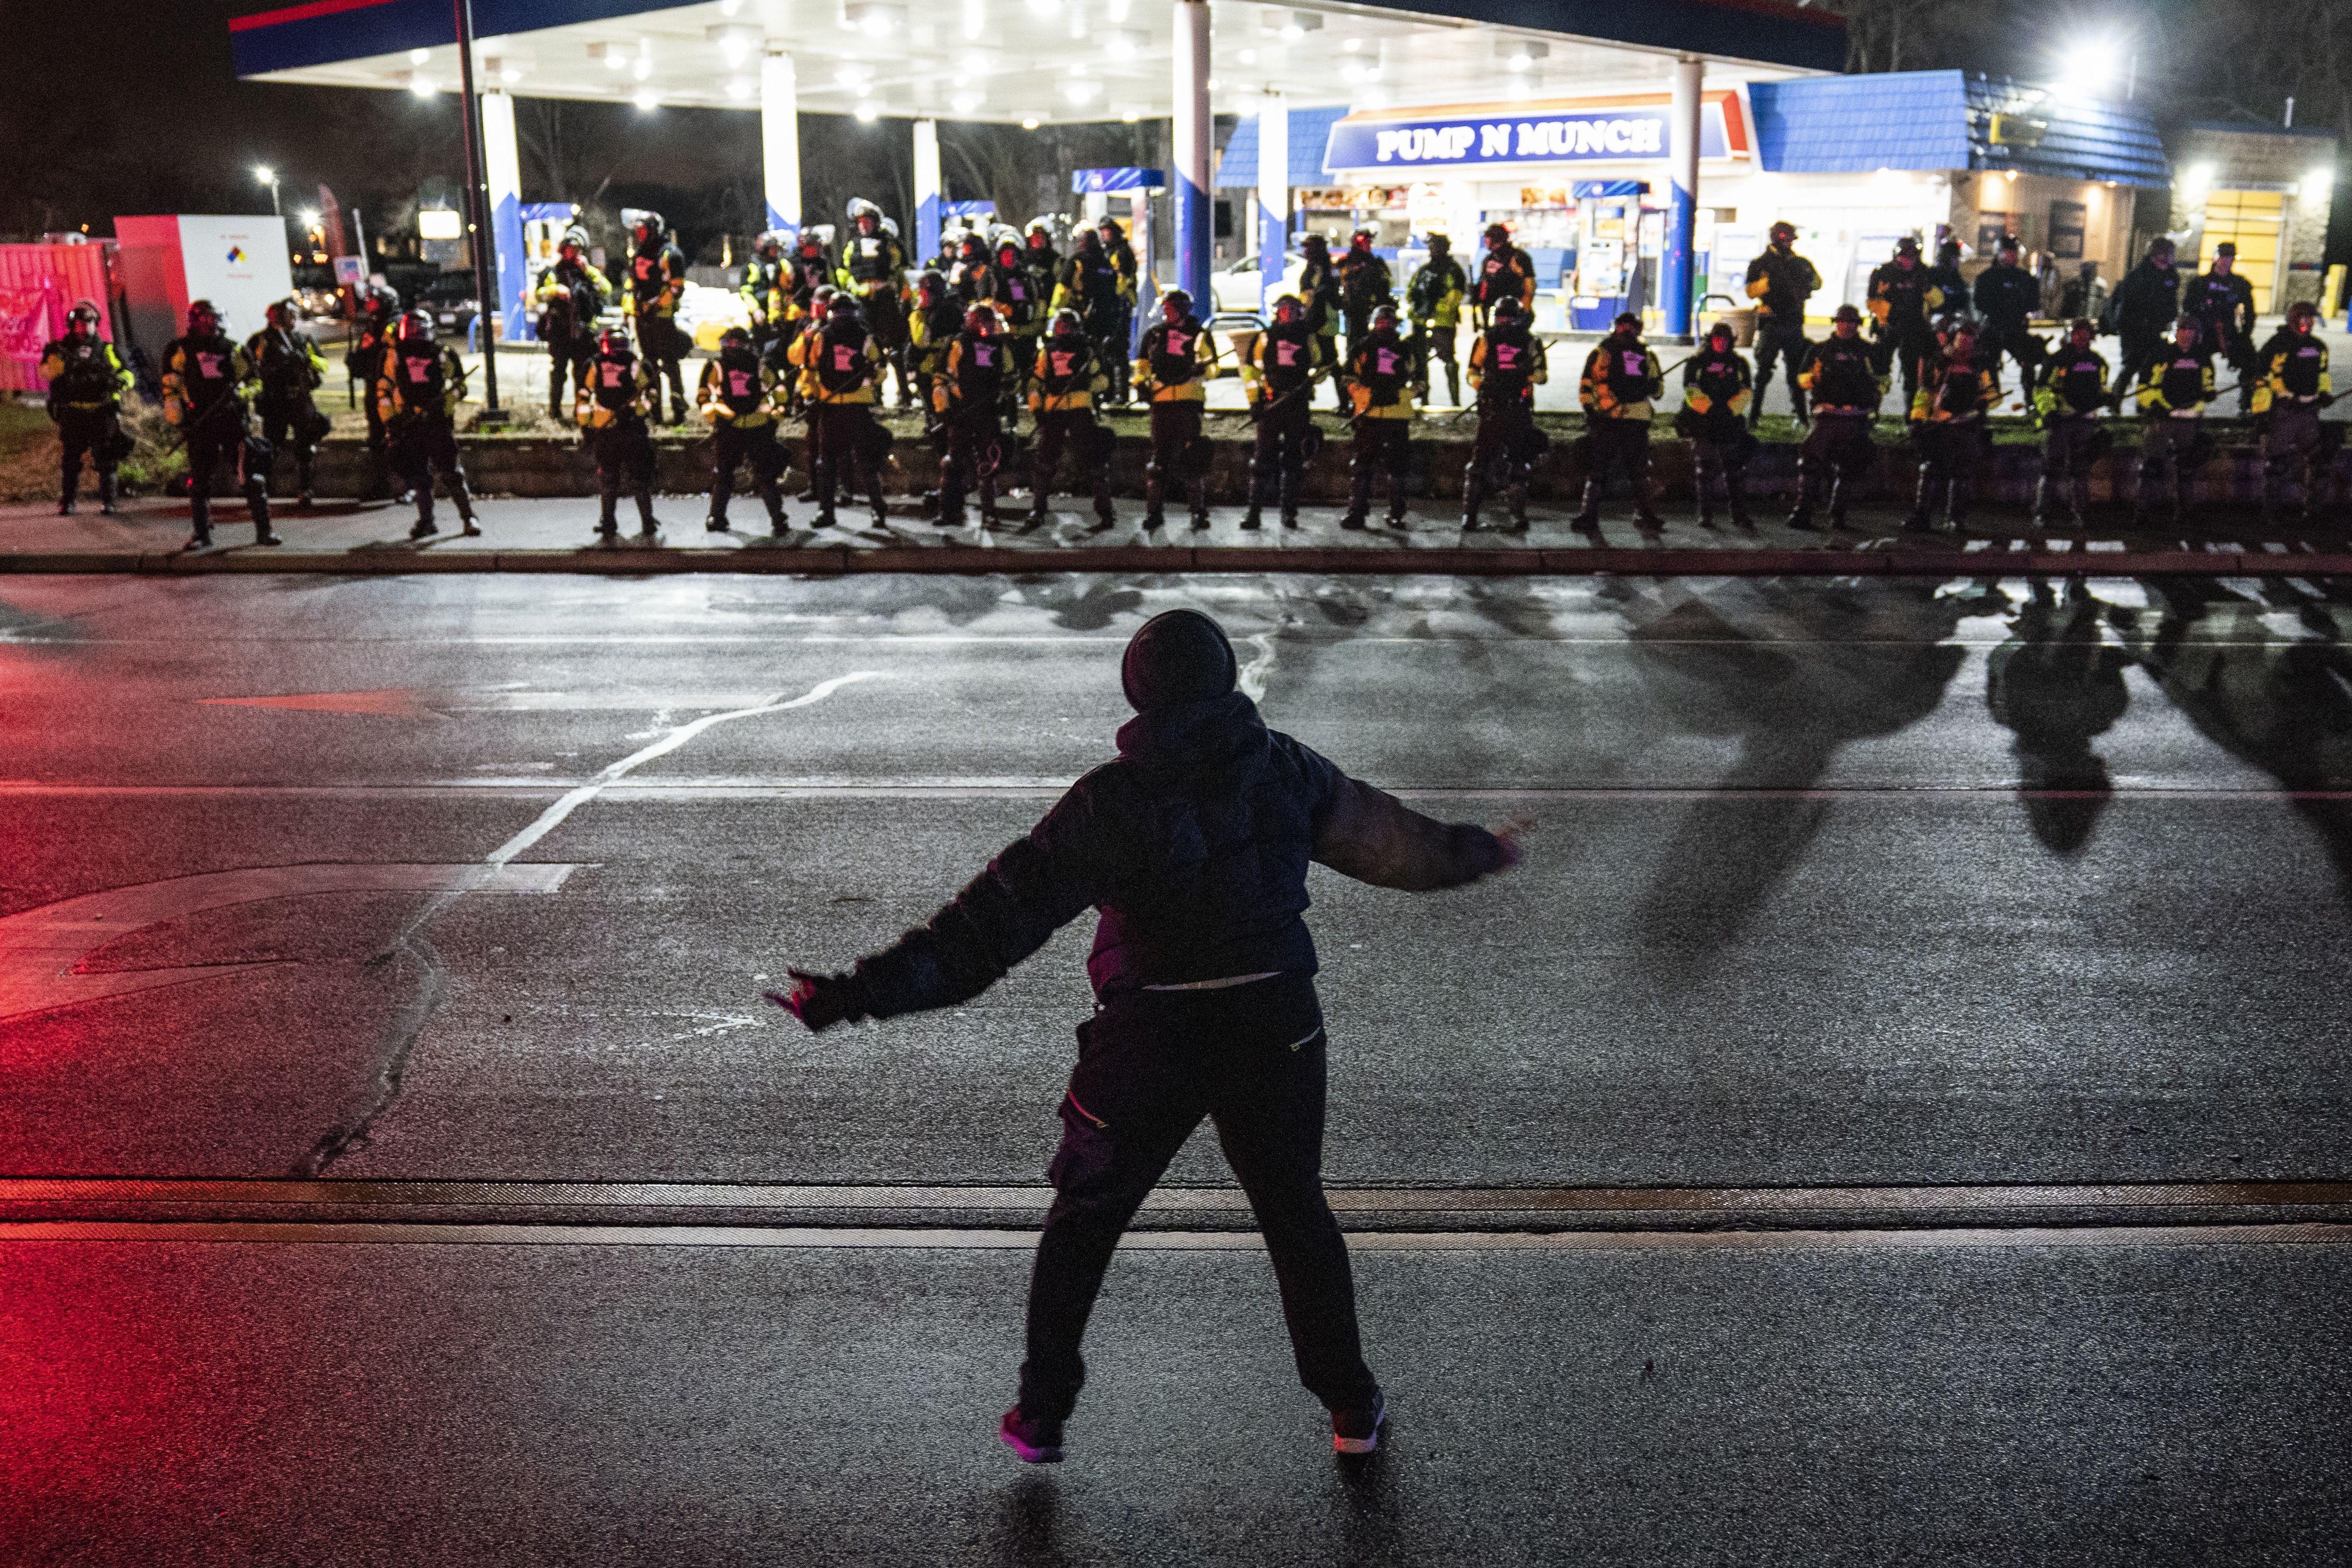 Protester heckling police